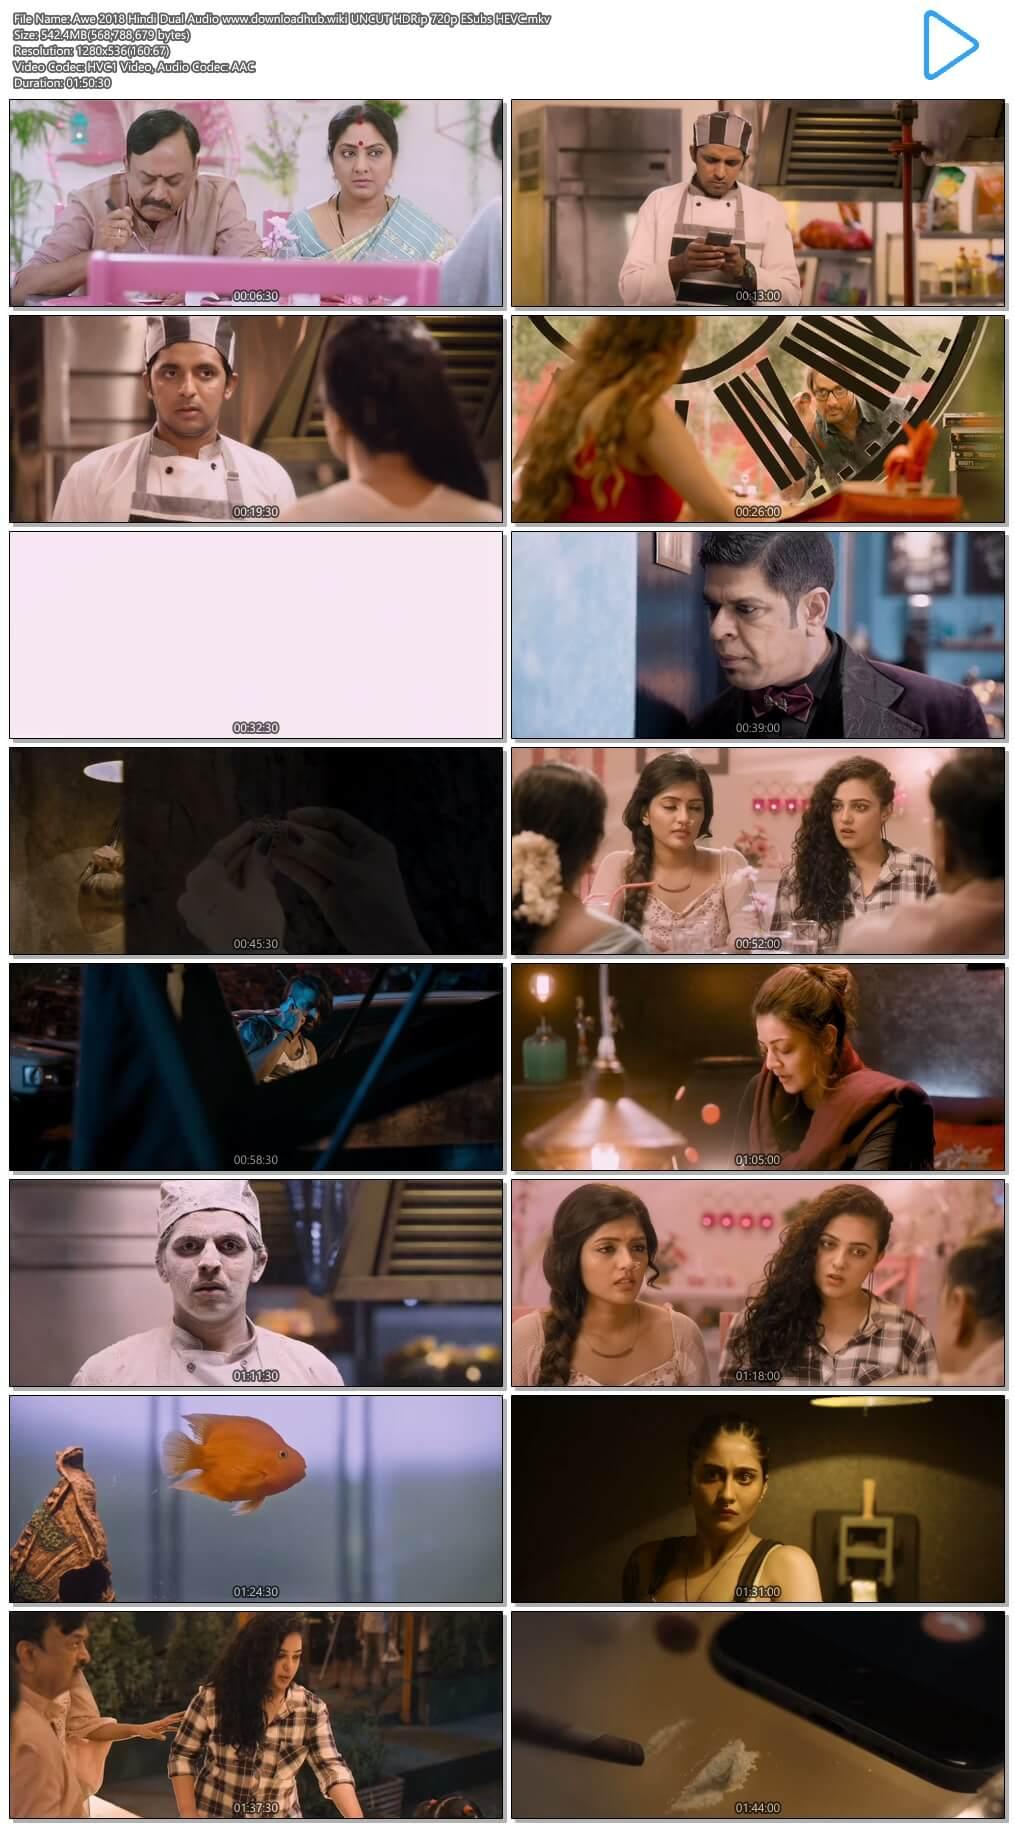 Awe 2018 Hindi Dual Audio 550MB UNCUT HDRip 720p ESubs HEVC